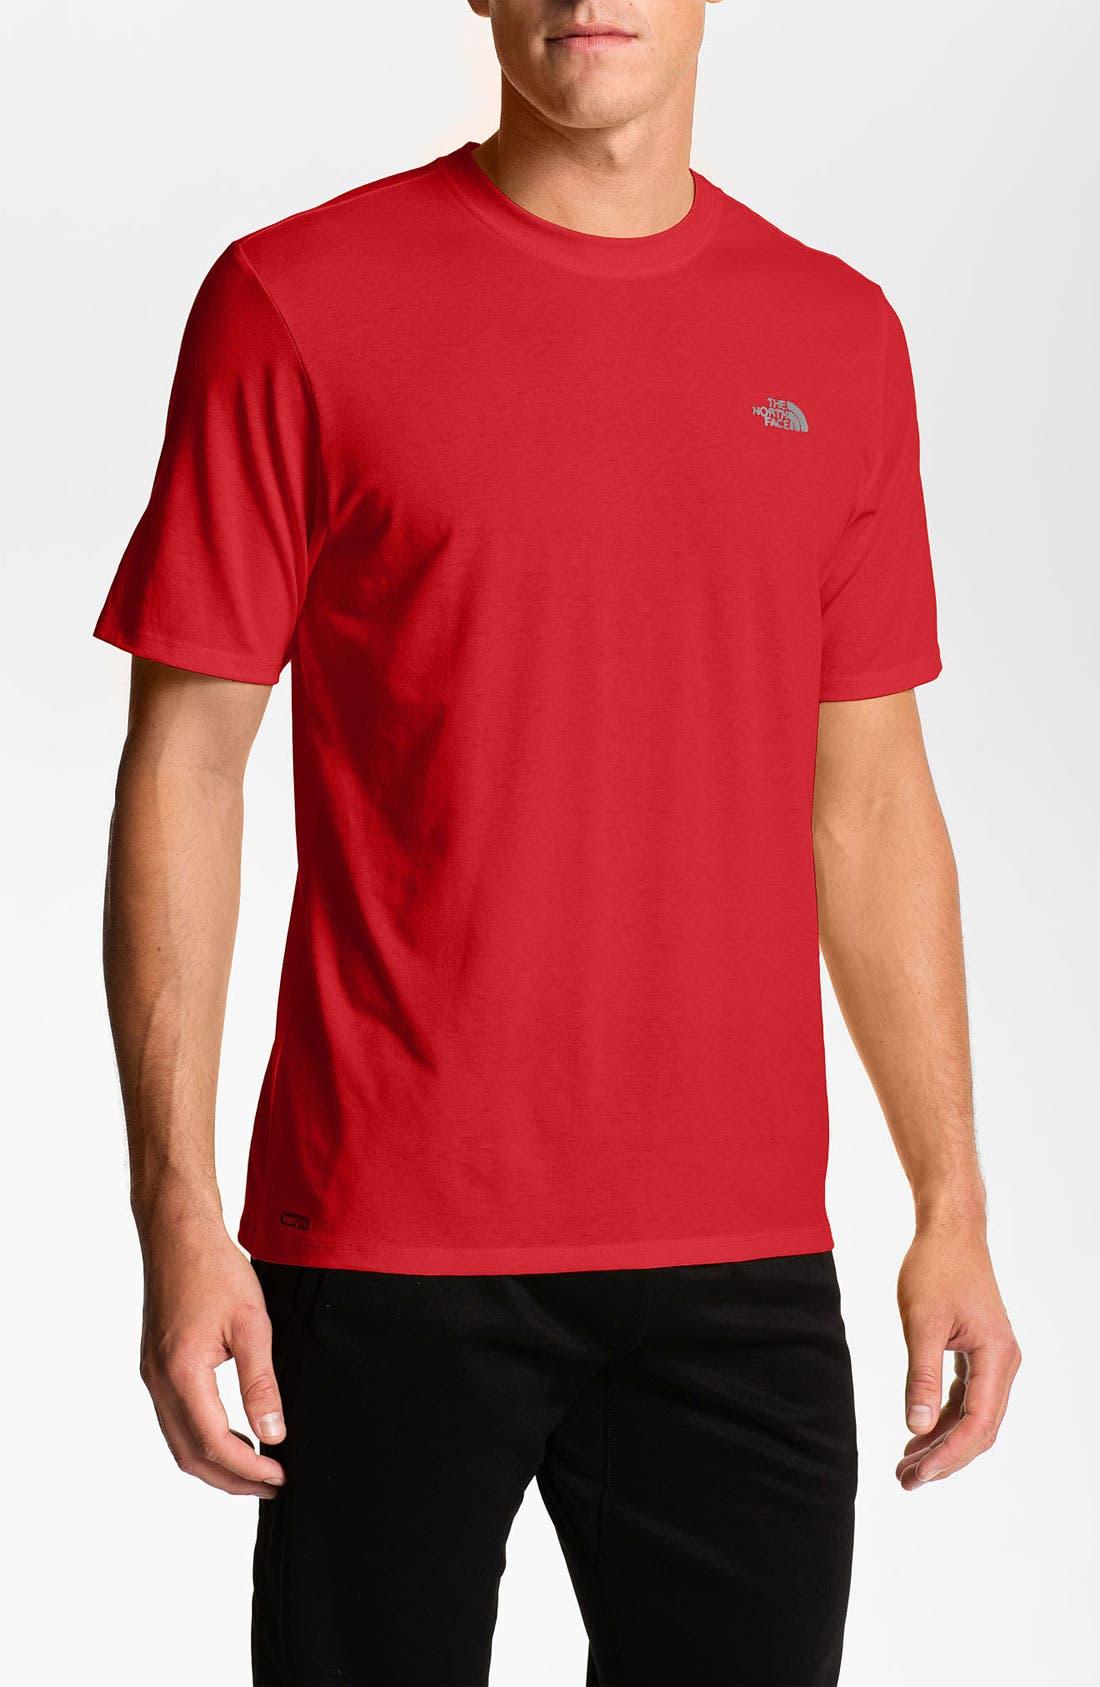 Main Image - The North Face 'Reaxion' VaporWick® Crewneck Shirt